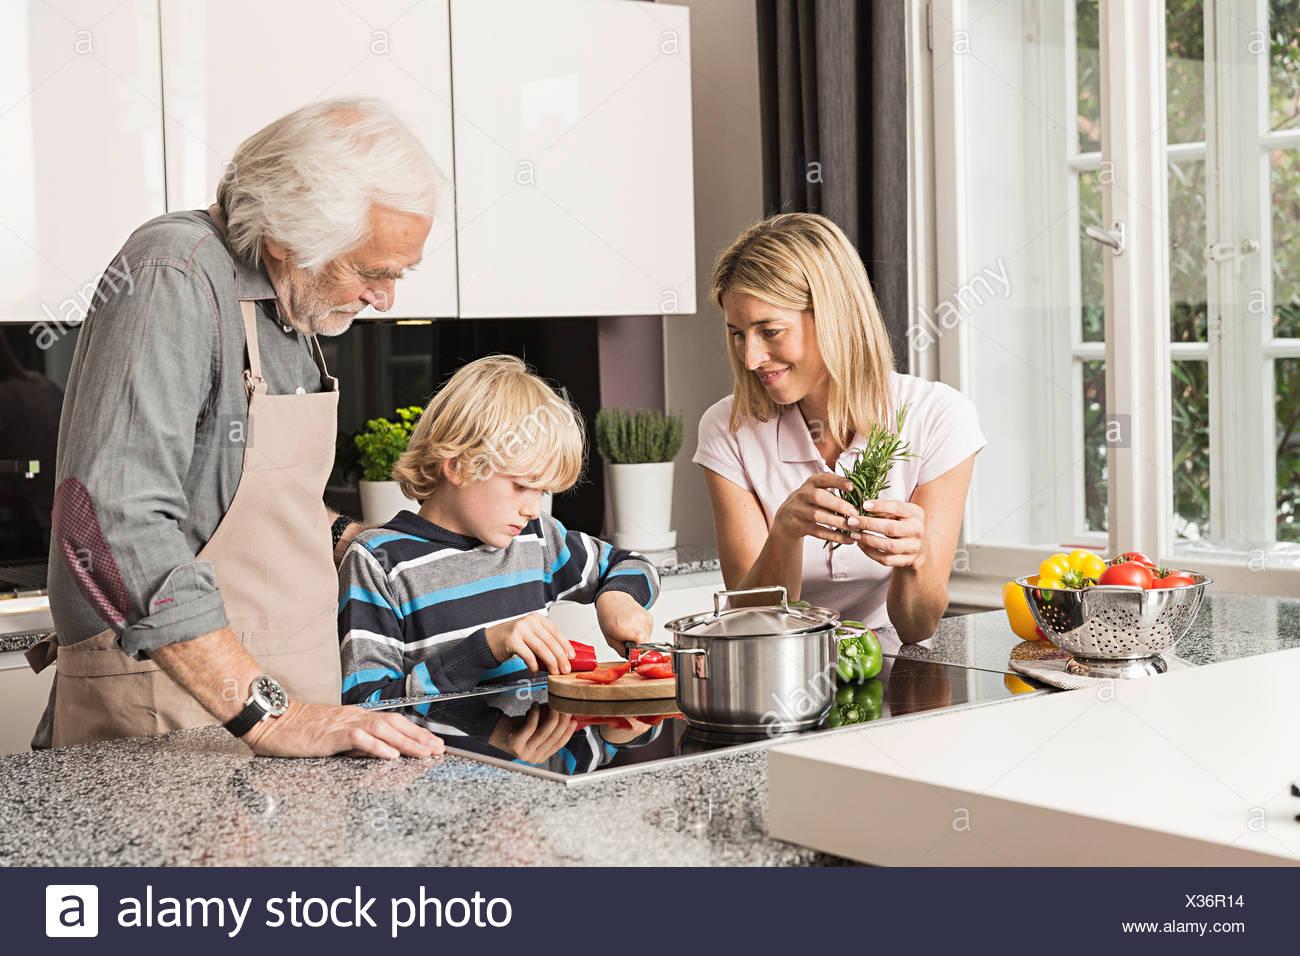 Three generation family preparing food - Stock Image